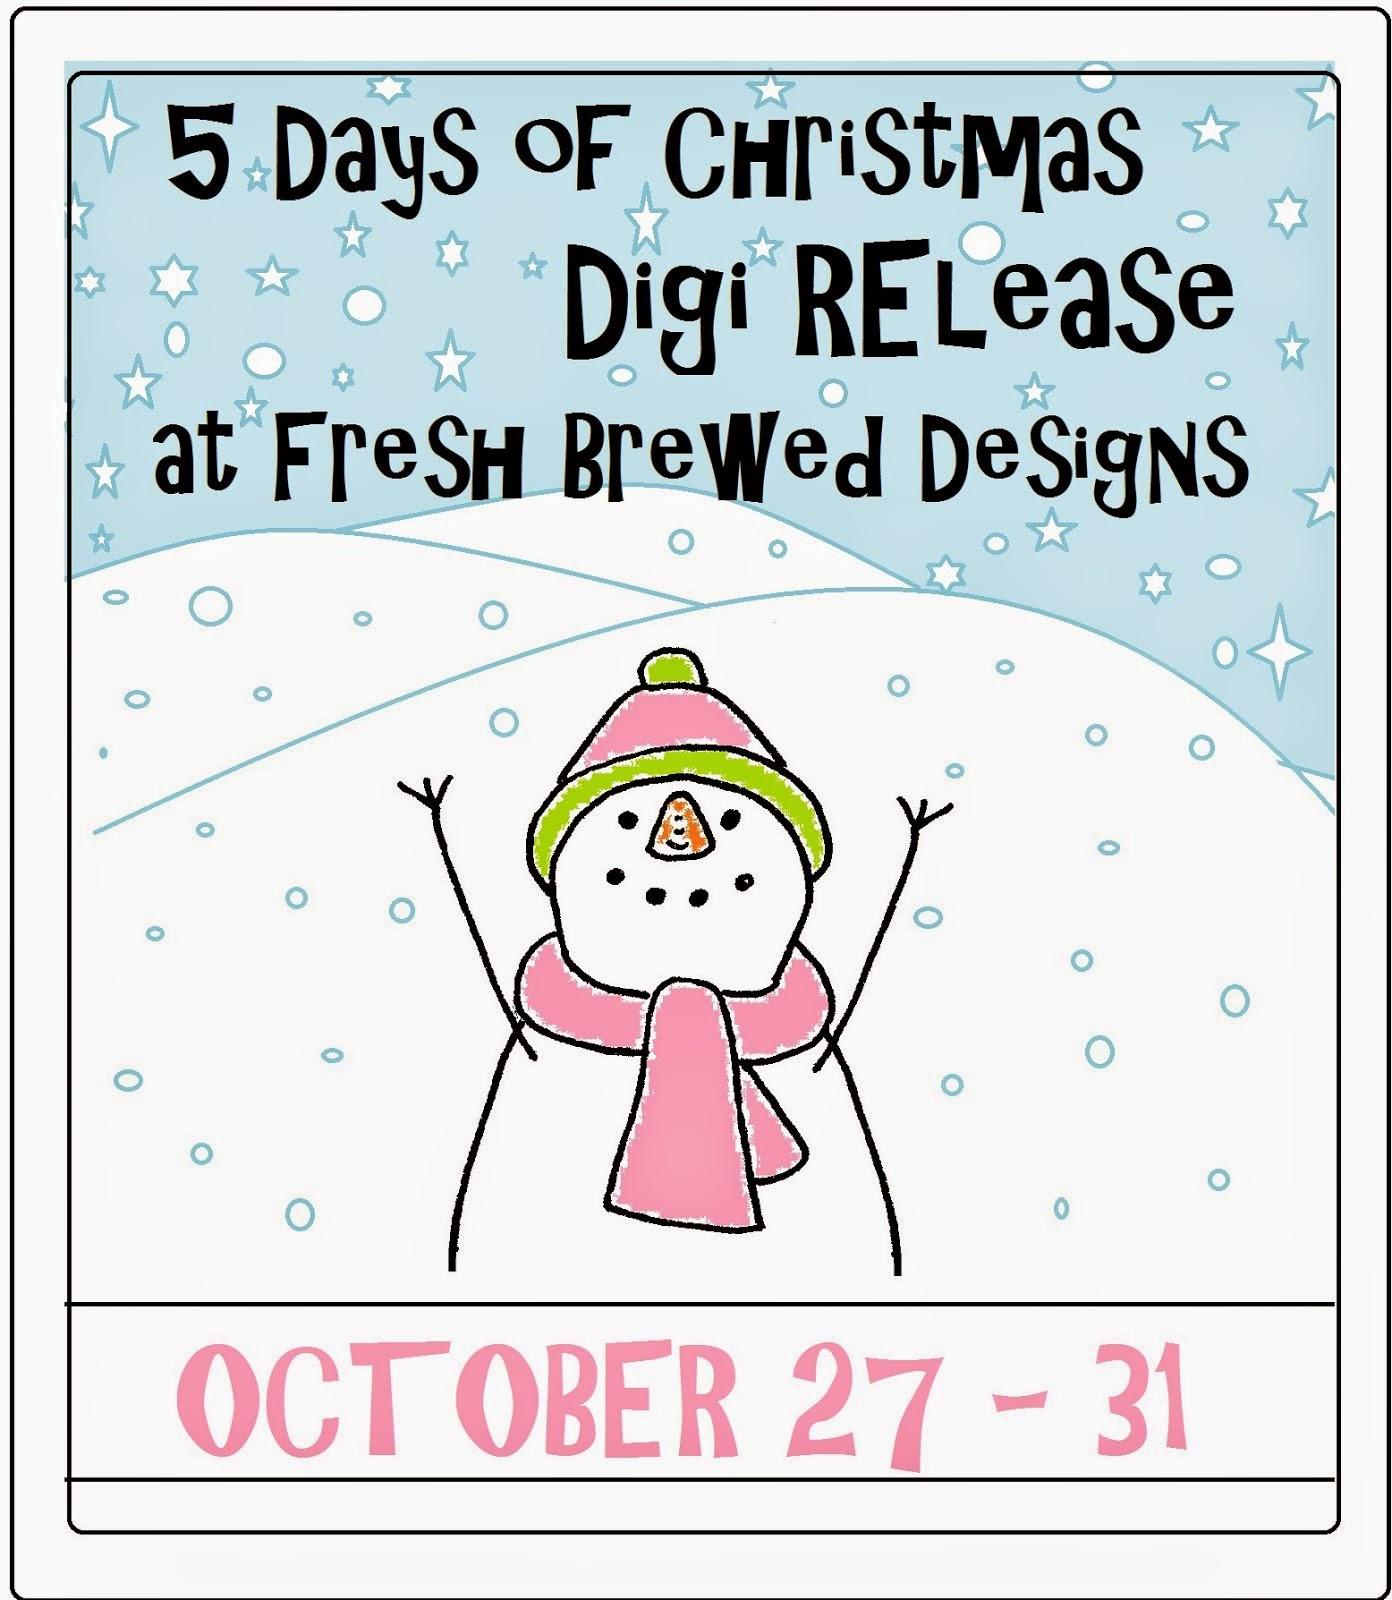 Fresh Brewed Designs Christmas digi release